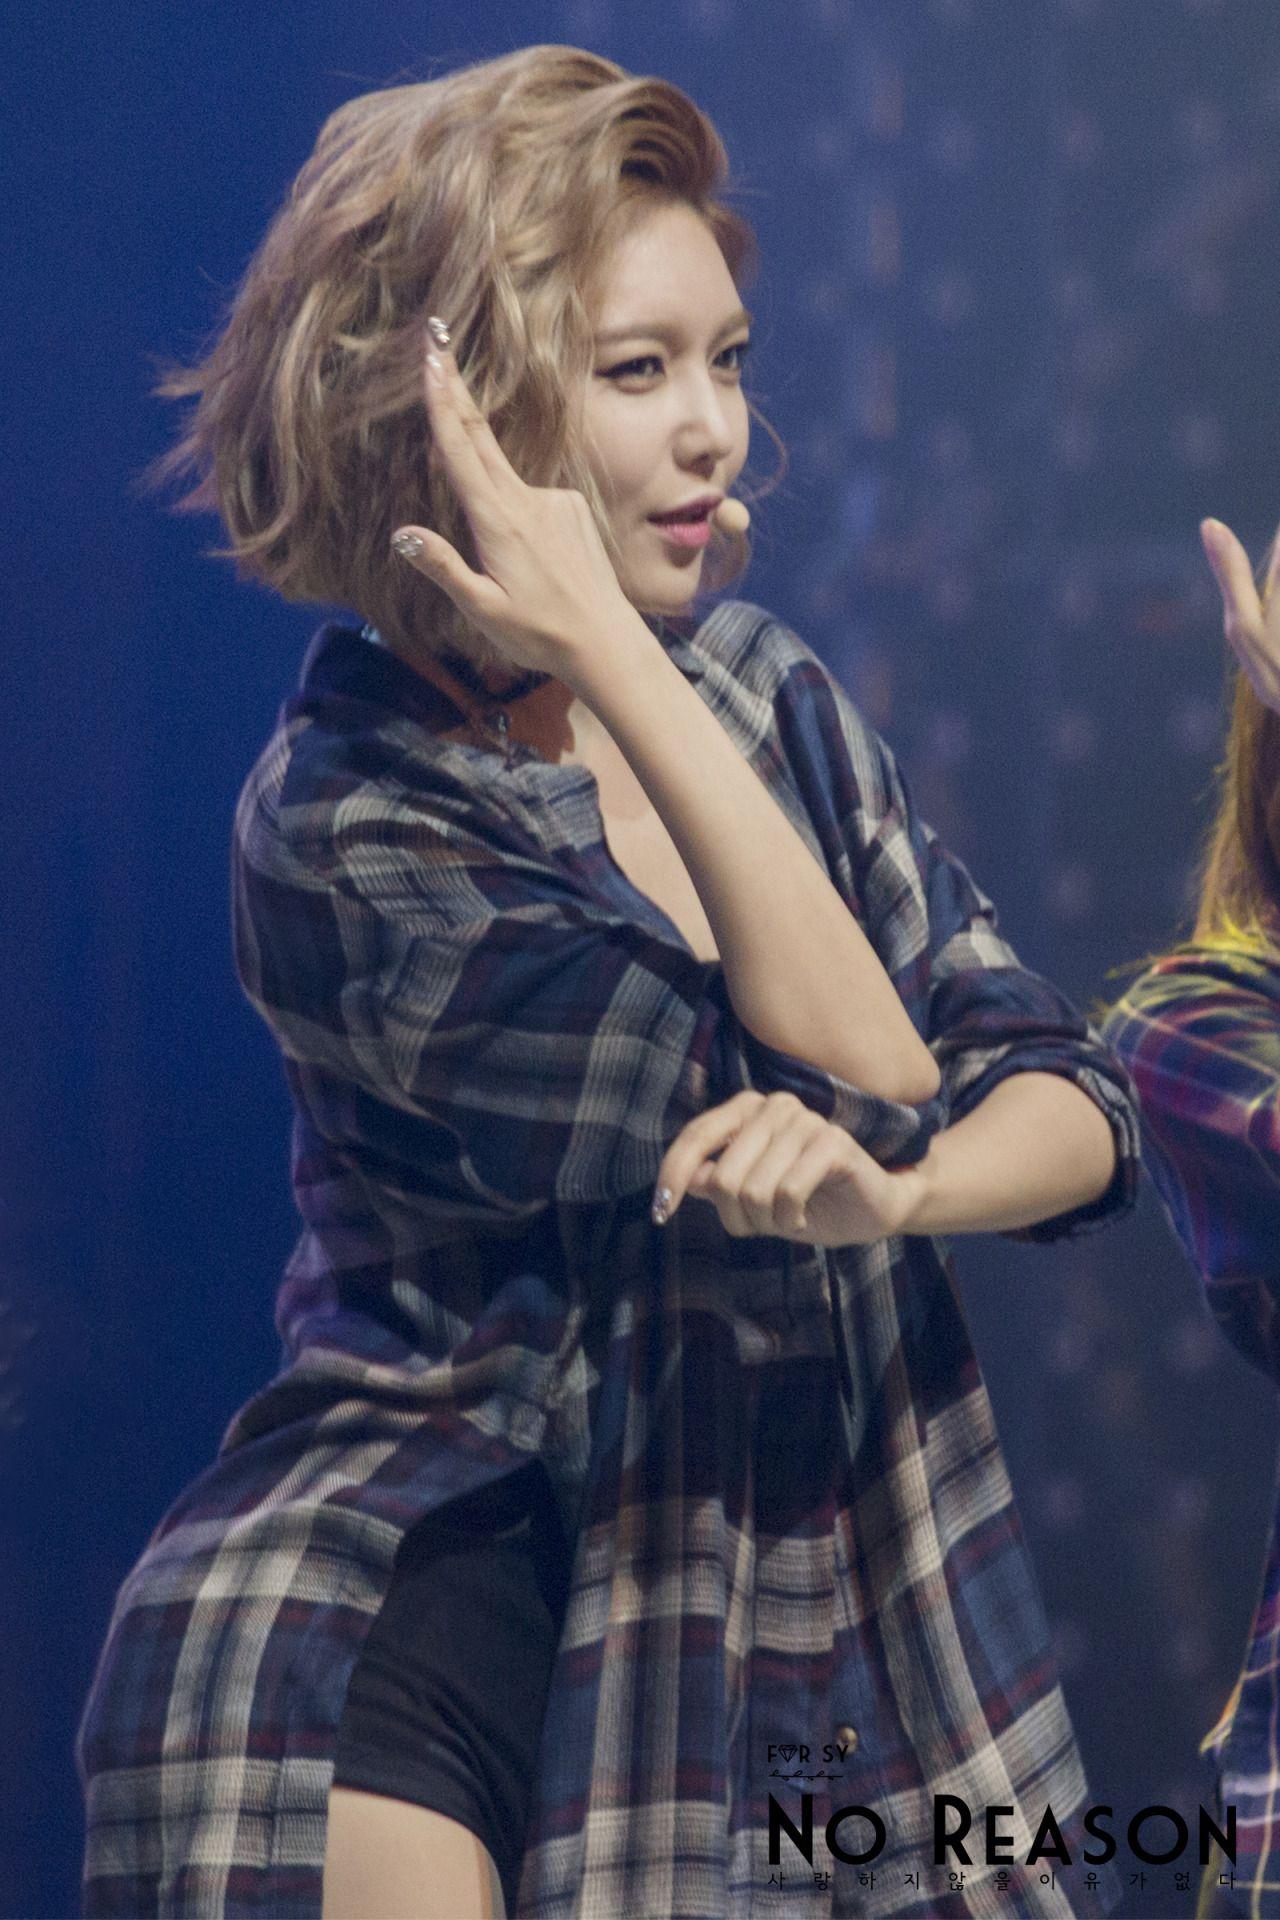 FY-GG 》 | Girls generation, Yuri, Wonder woman